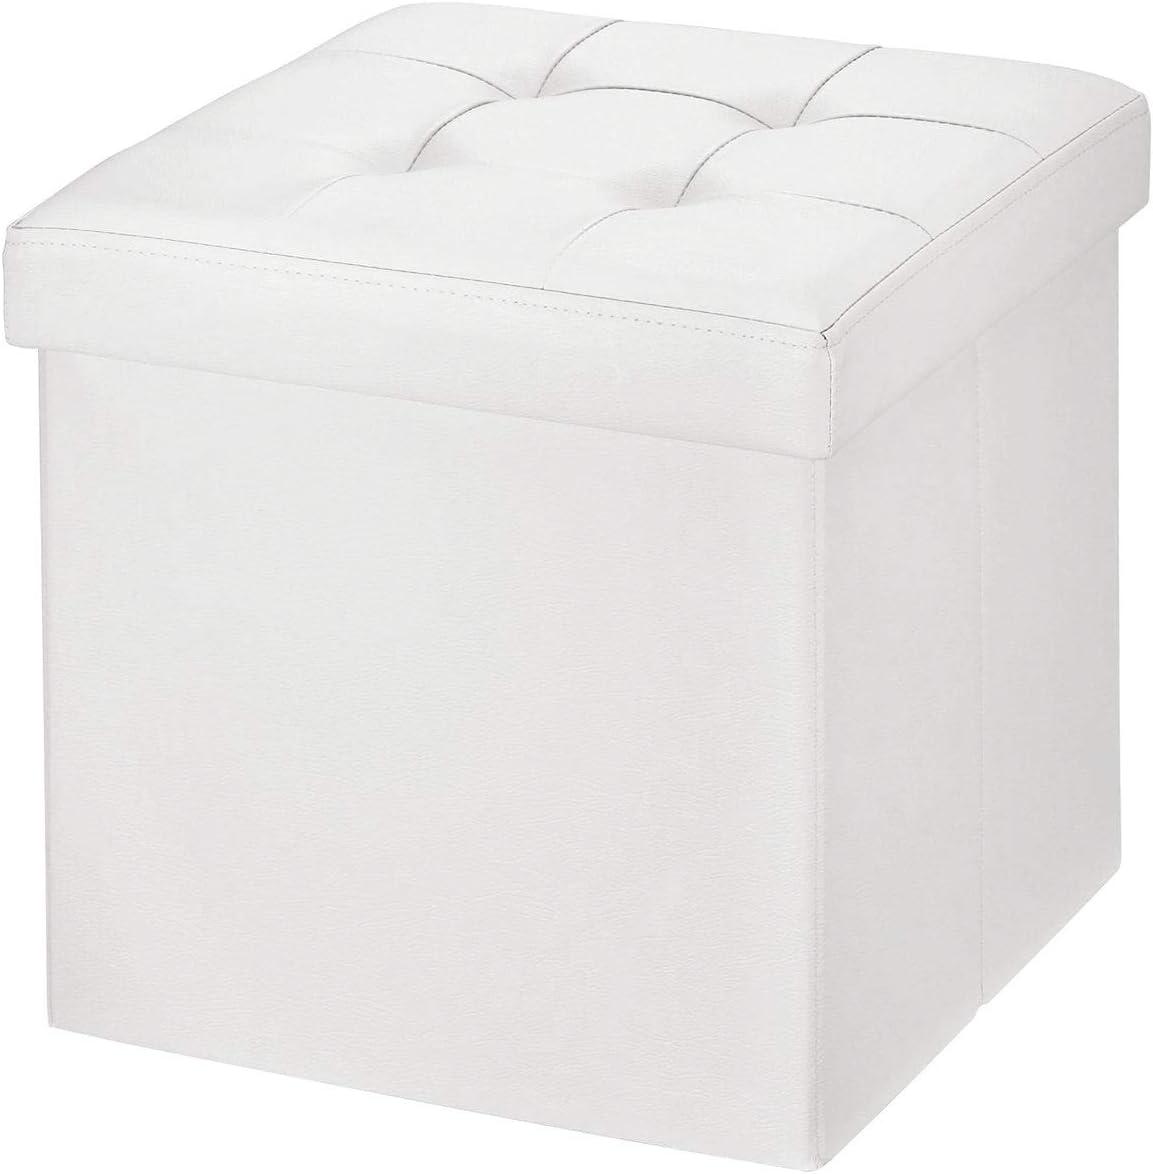 BRIAN & DANY Baúl Puff Taburete Plegable de Almacenamiento Banco Otomano Asiento, Piel sintética, 38 x 38 x 38 cm, Blanco